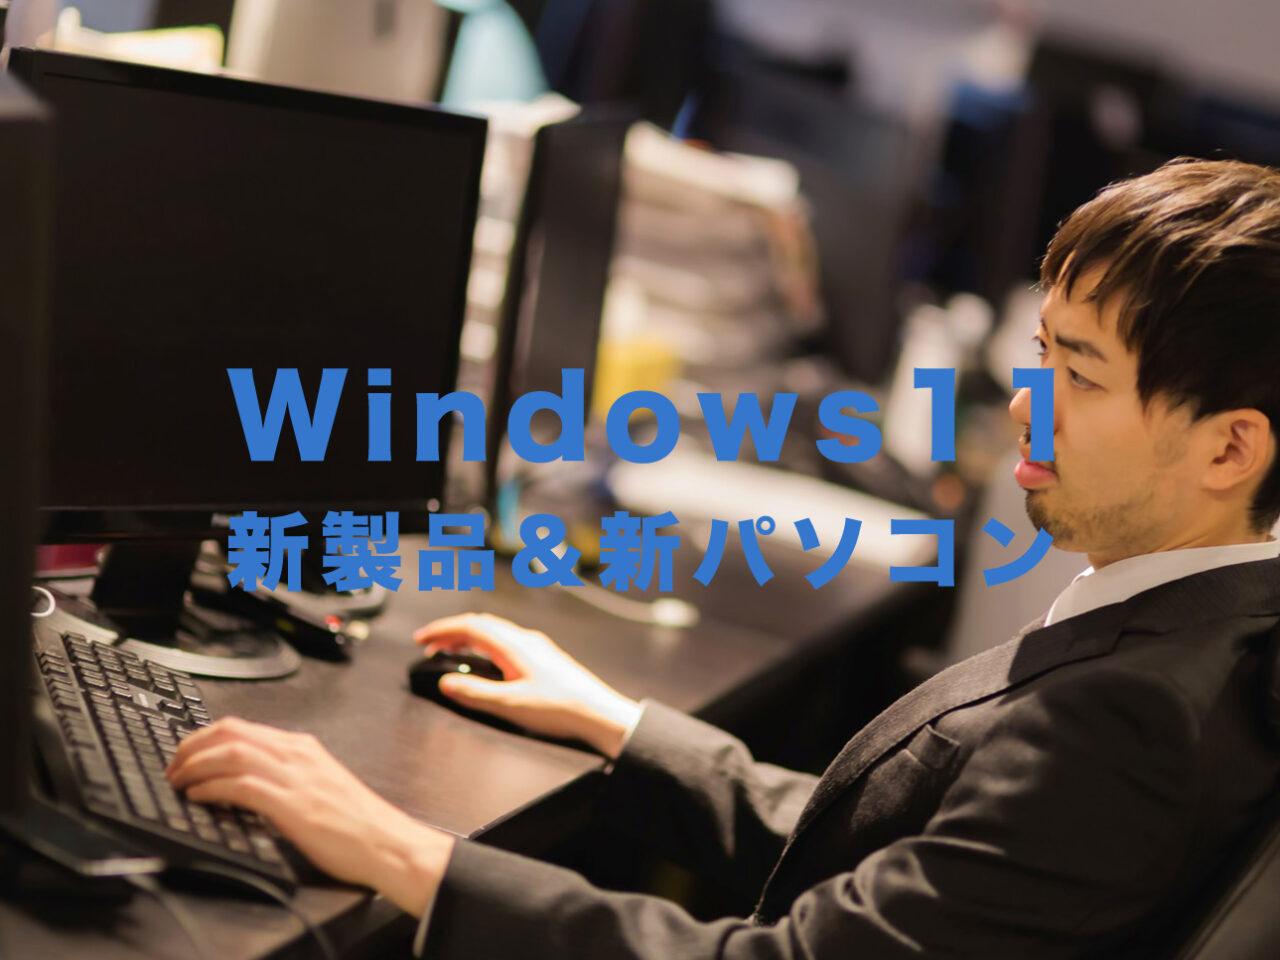 Windows11の新パソコン&新製品まとめ!各社から続々登場予定!のサムネイル画像